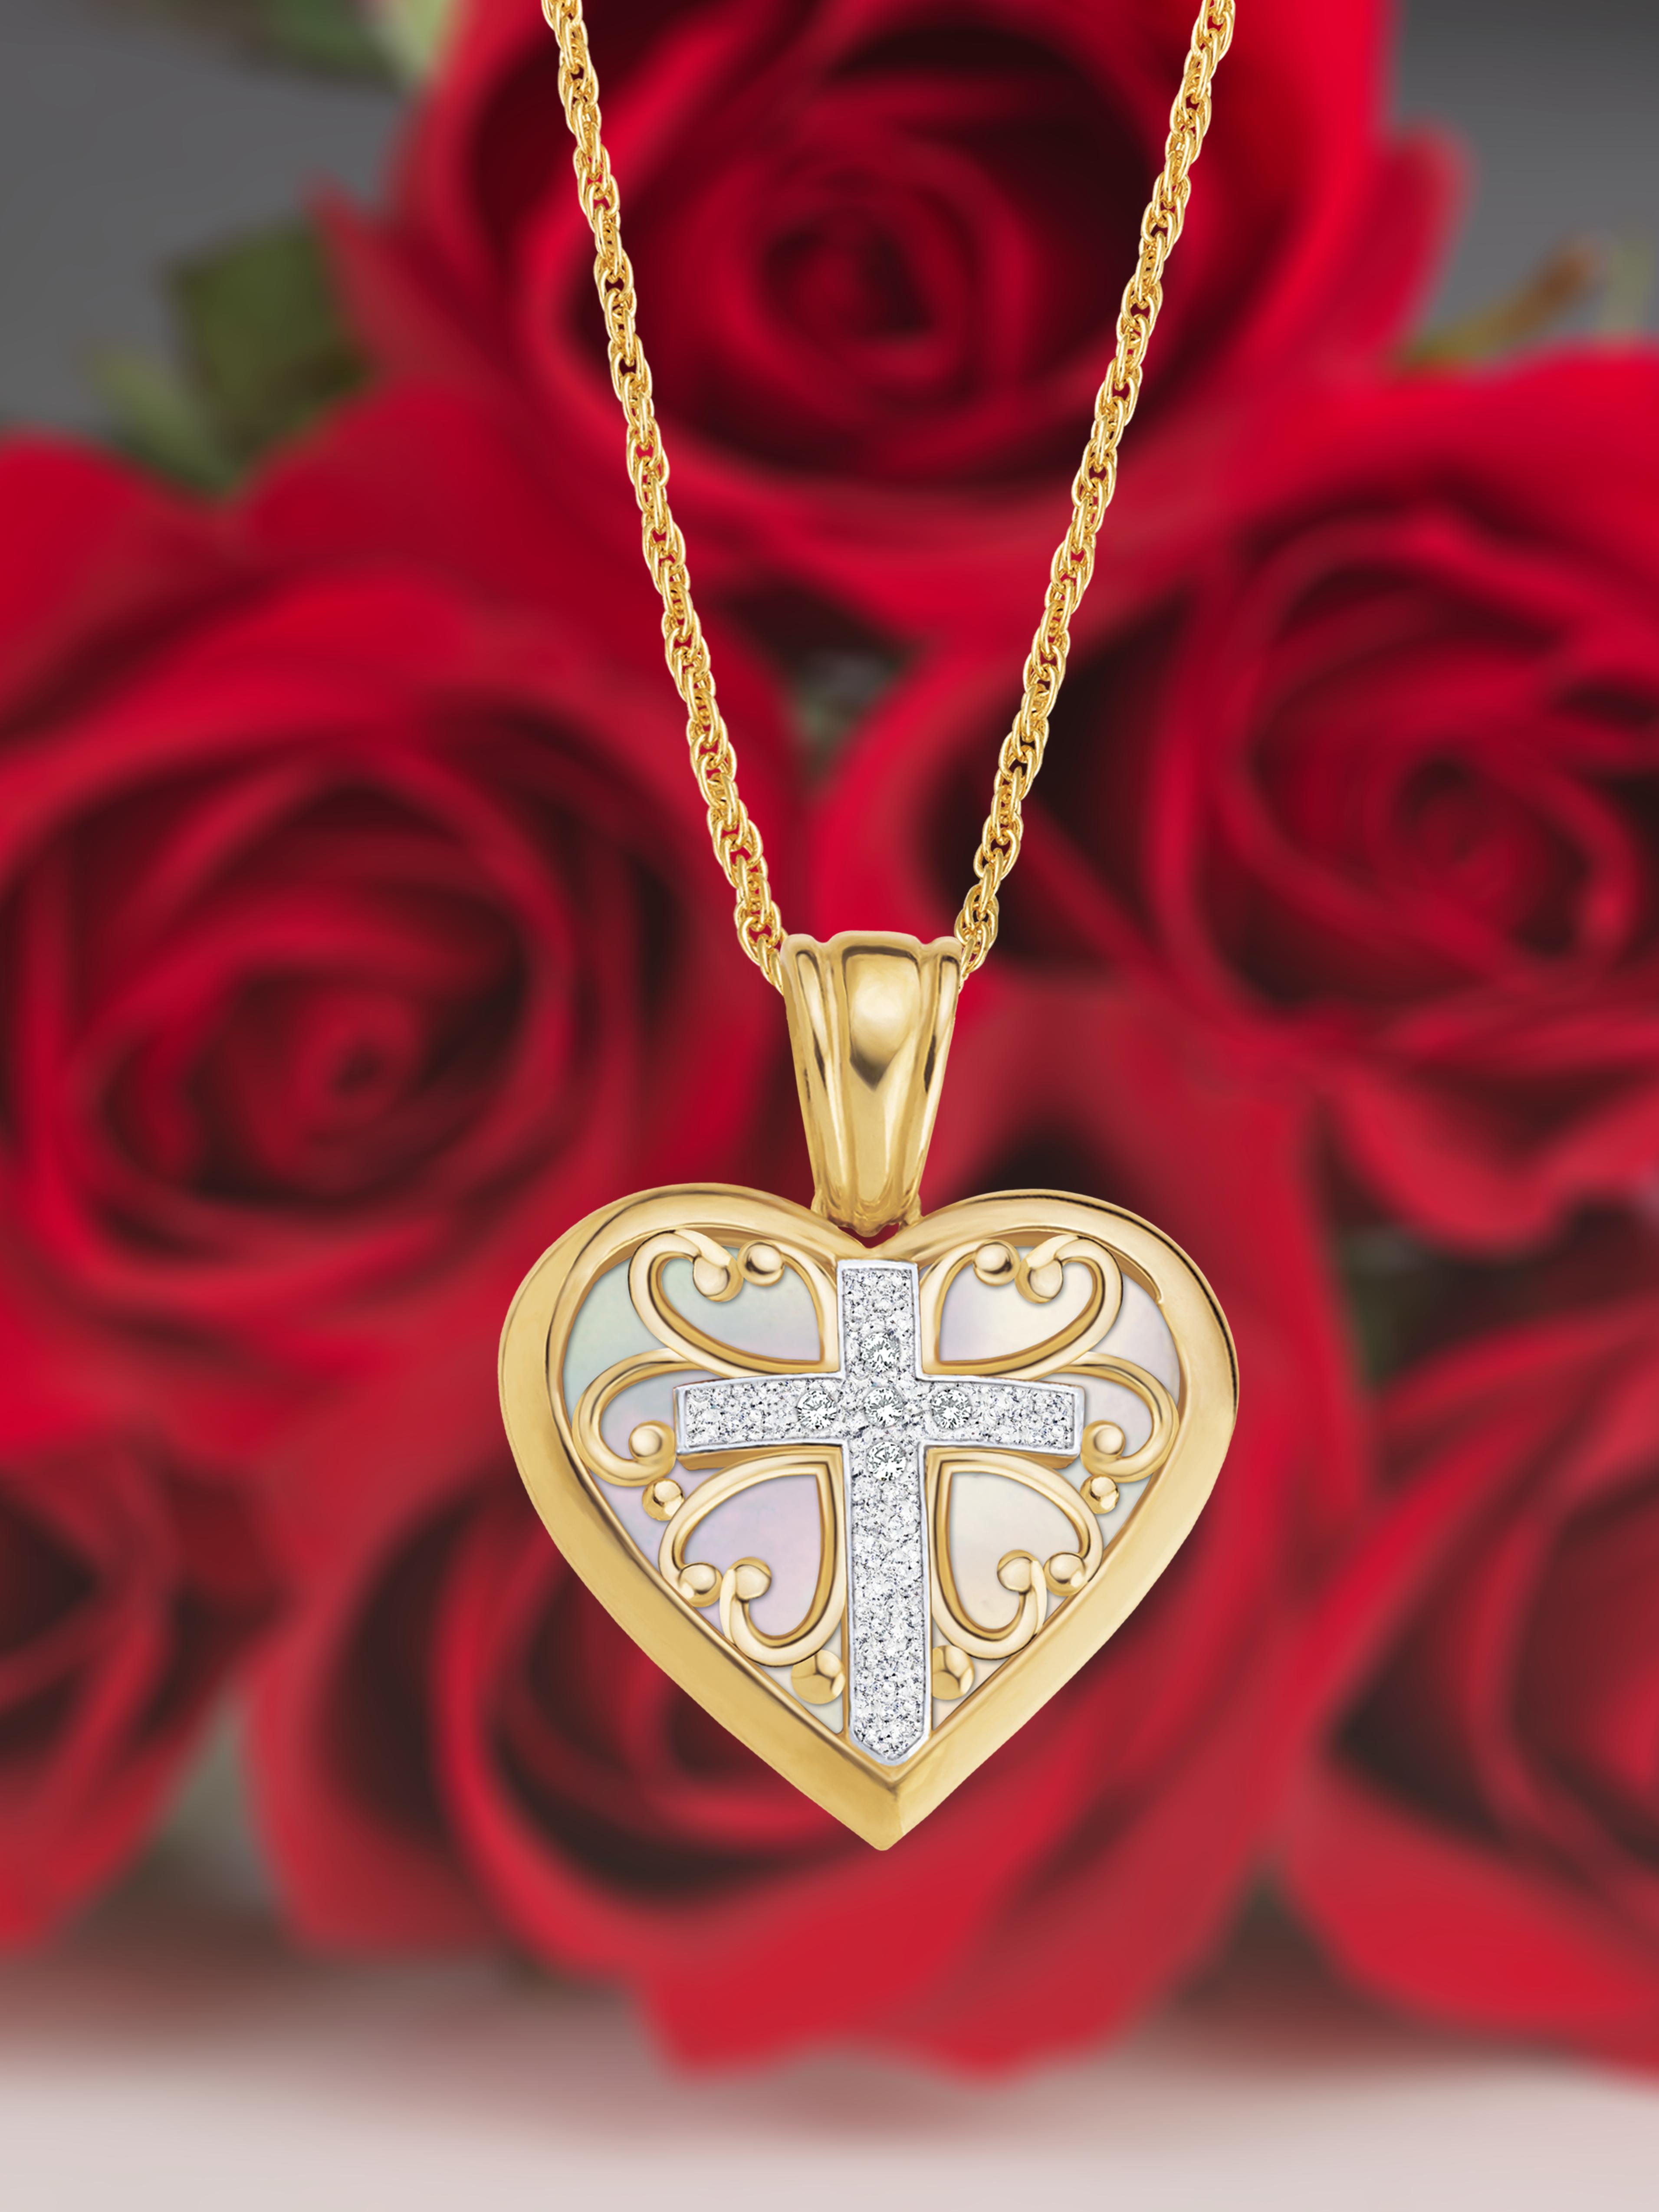 DiamondJewelryNY 14kt Gold Filled Mother of God Pendant